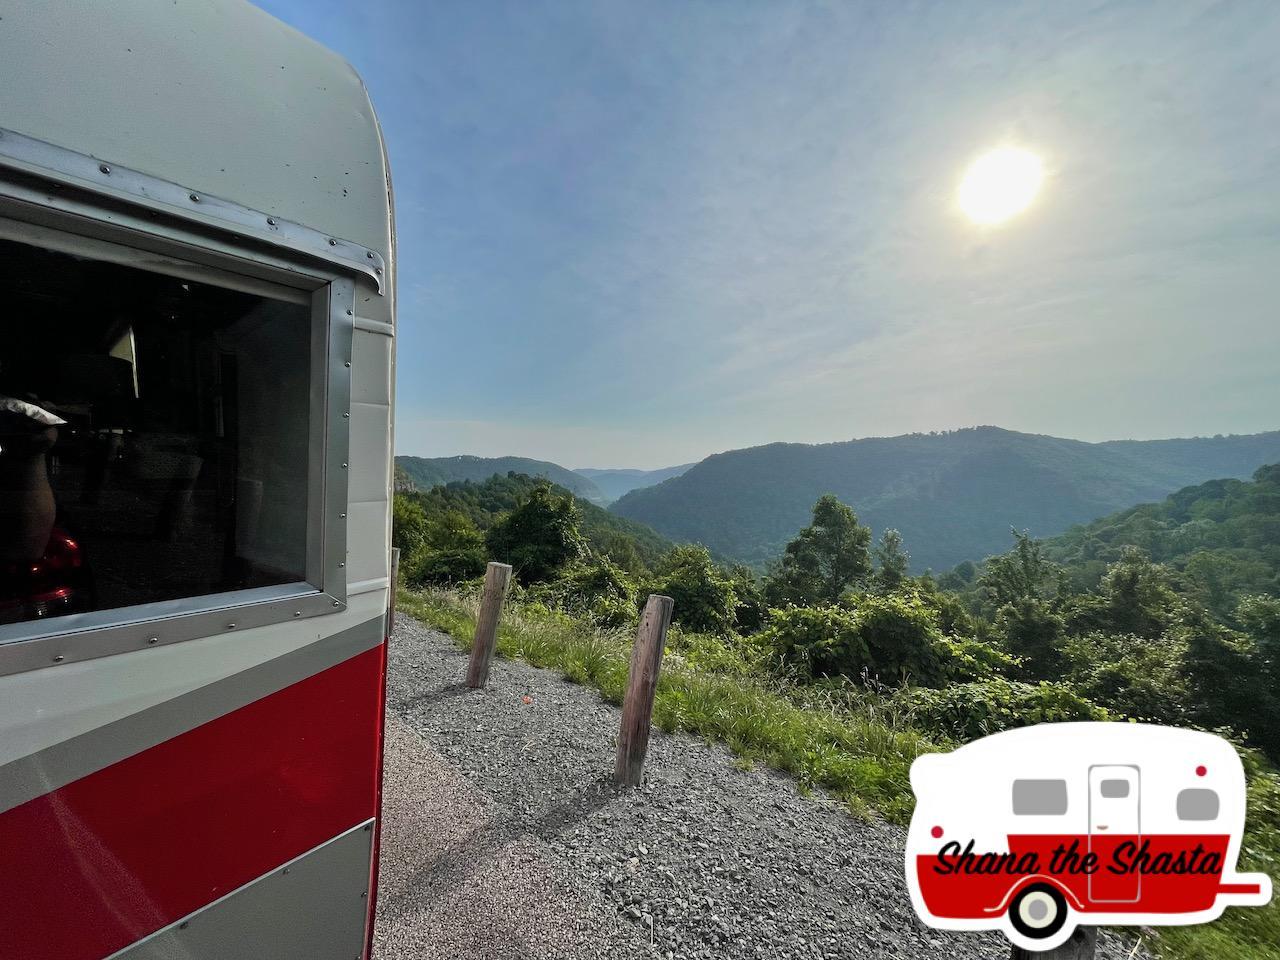 Vintage-Camper-West-Virginia-Overlook